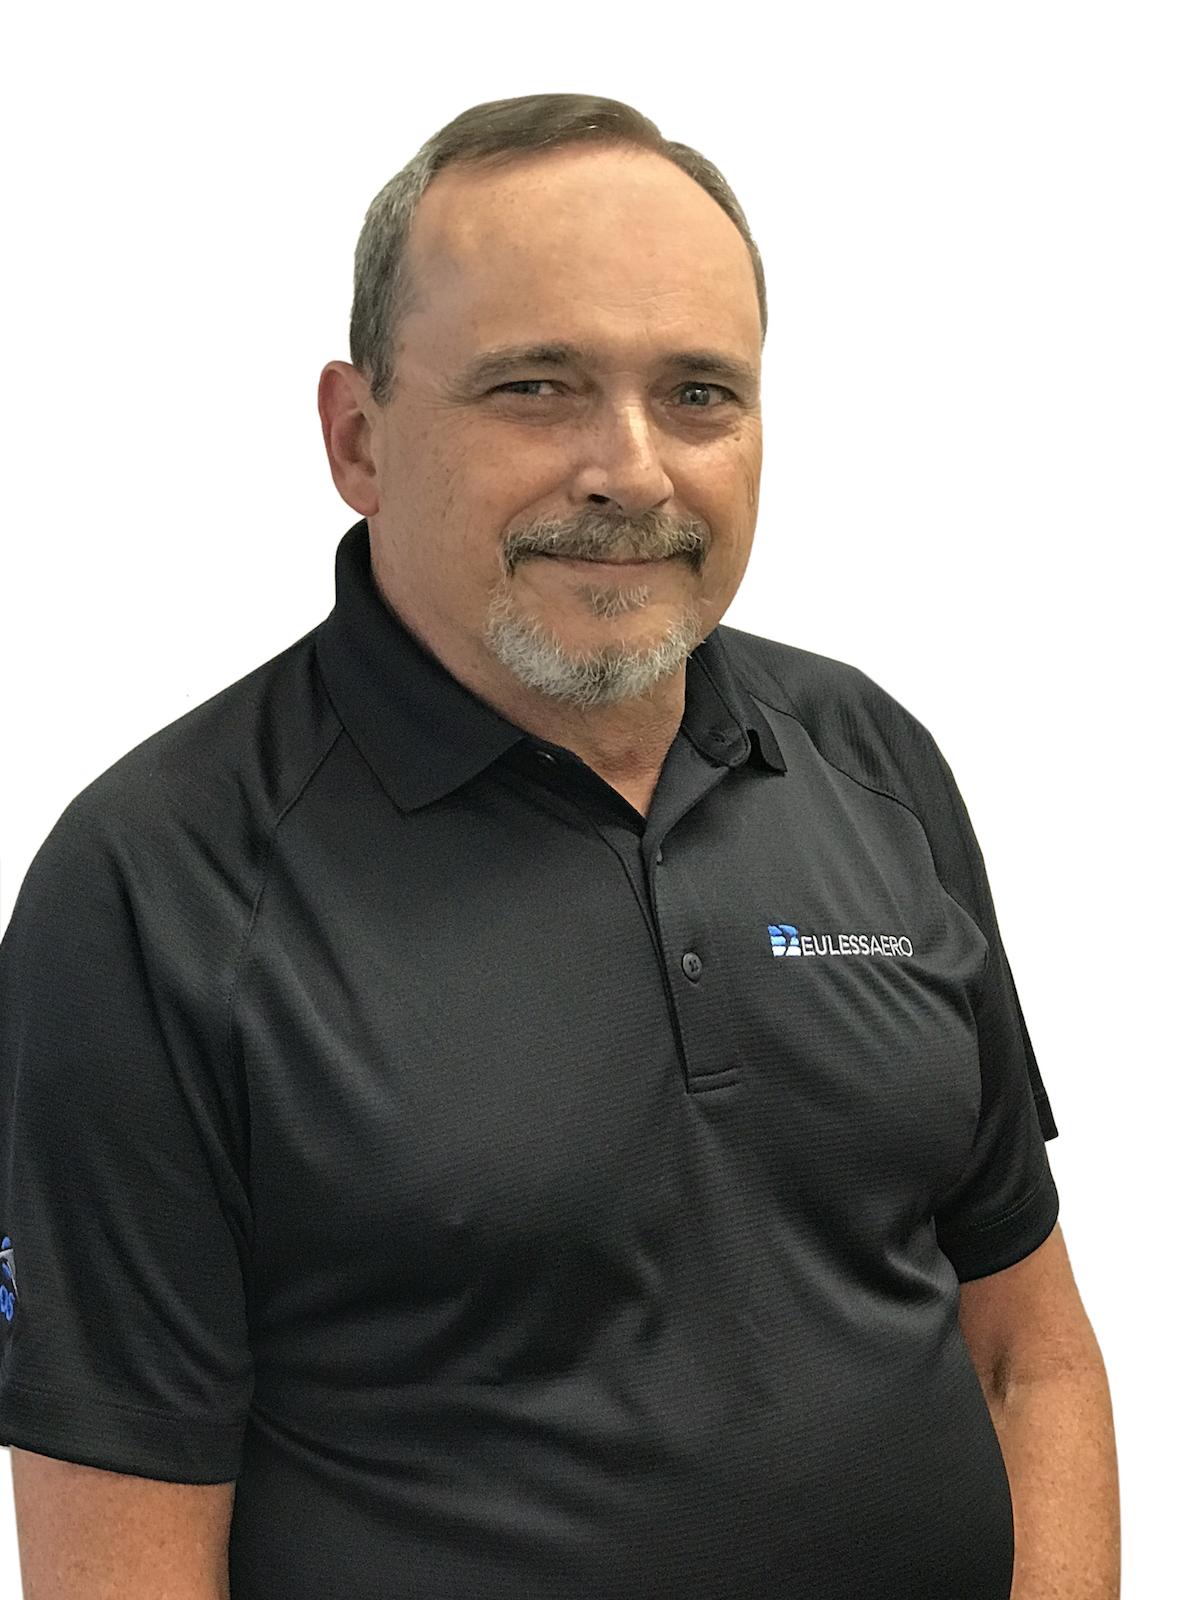 Randy Porter, Aerospace Machinist, EulessAero, An Aereos Operating